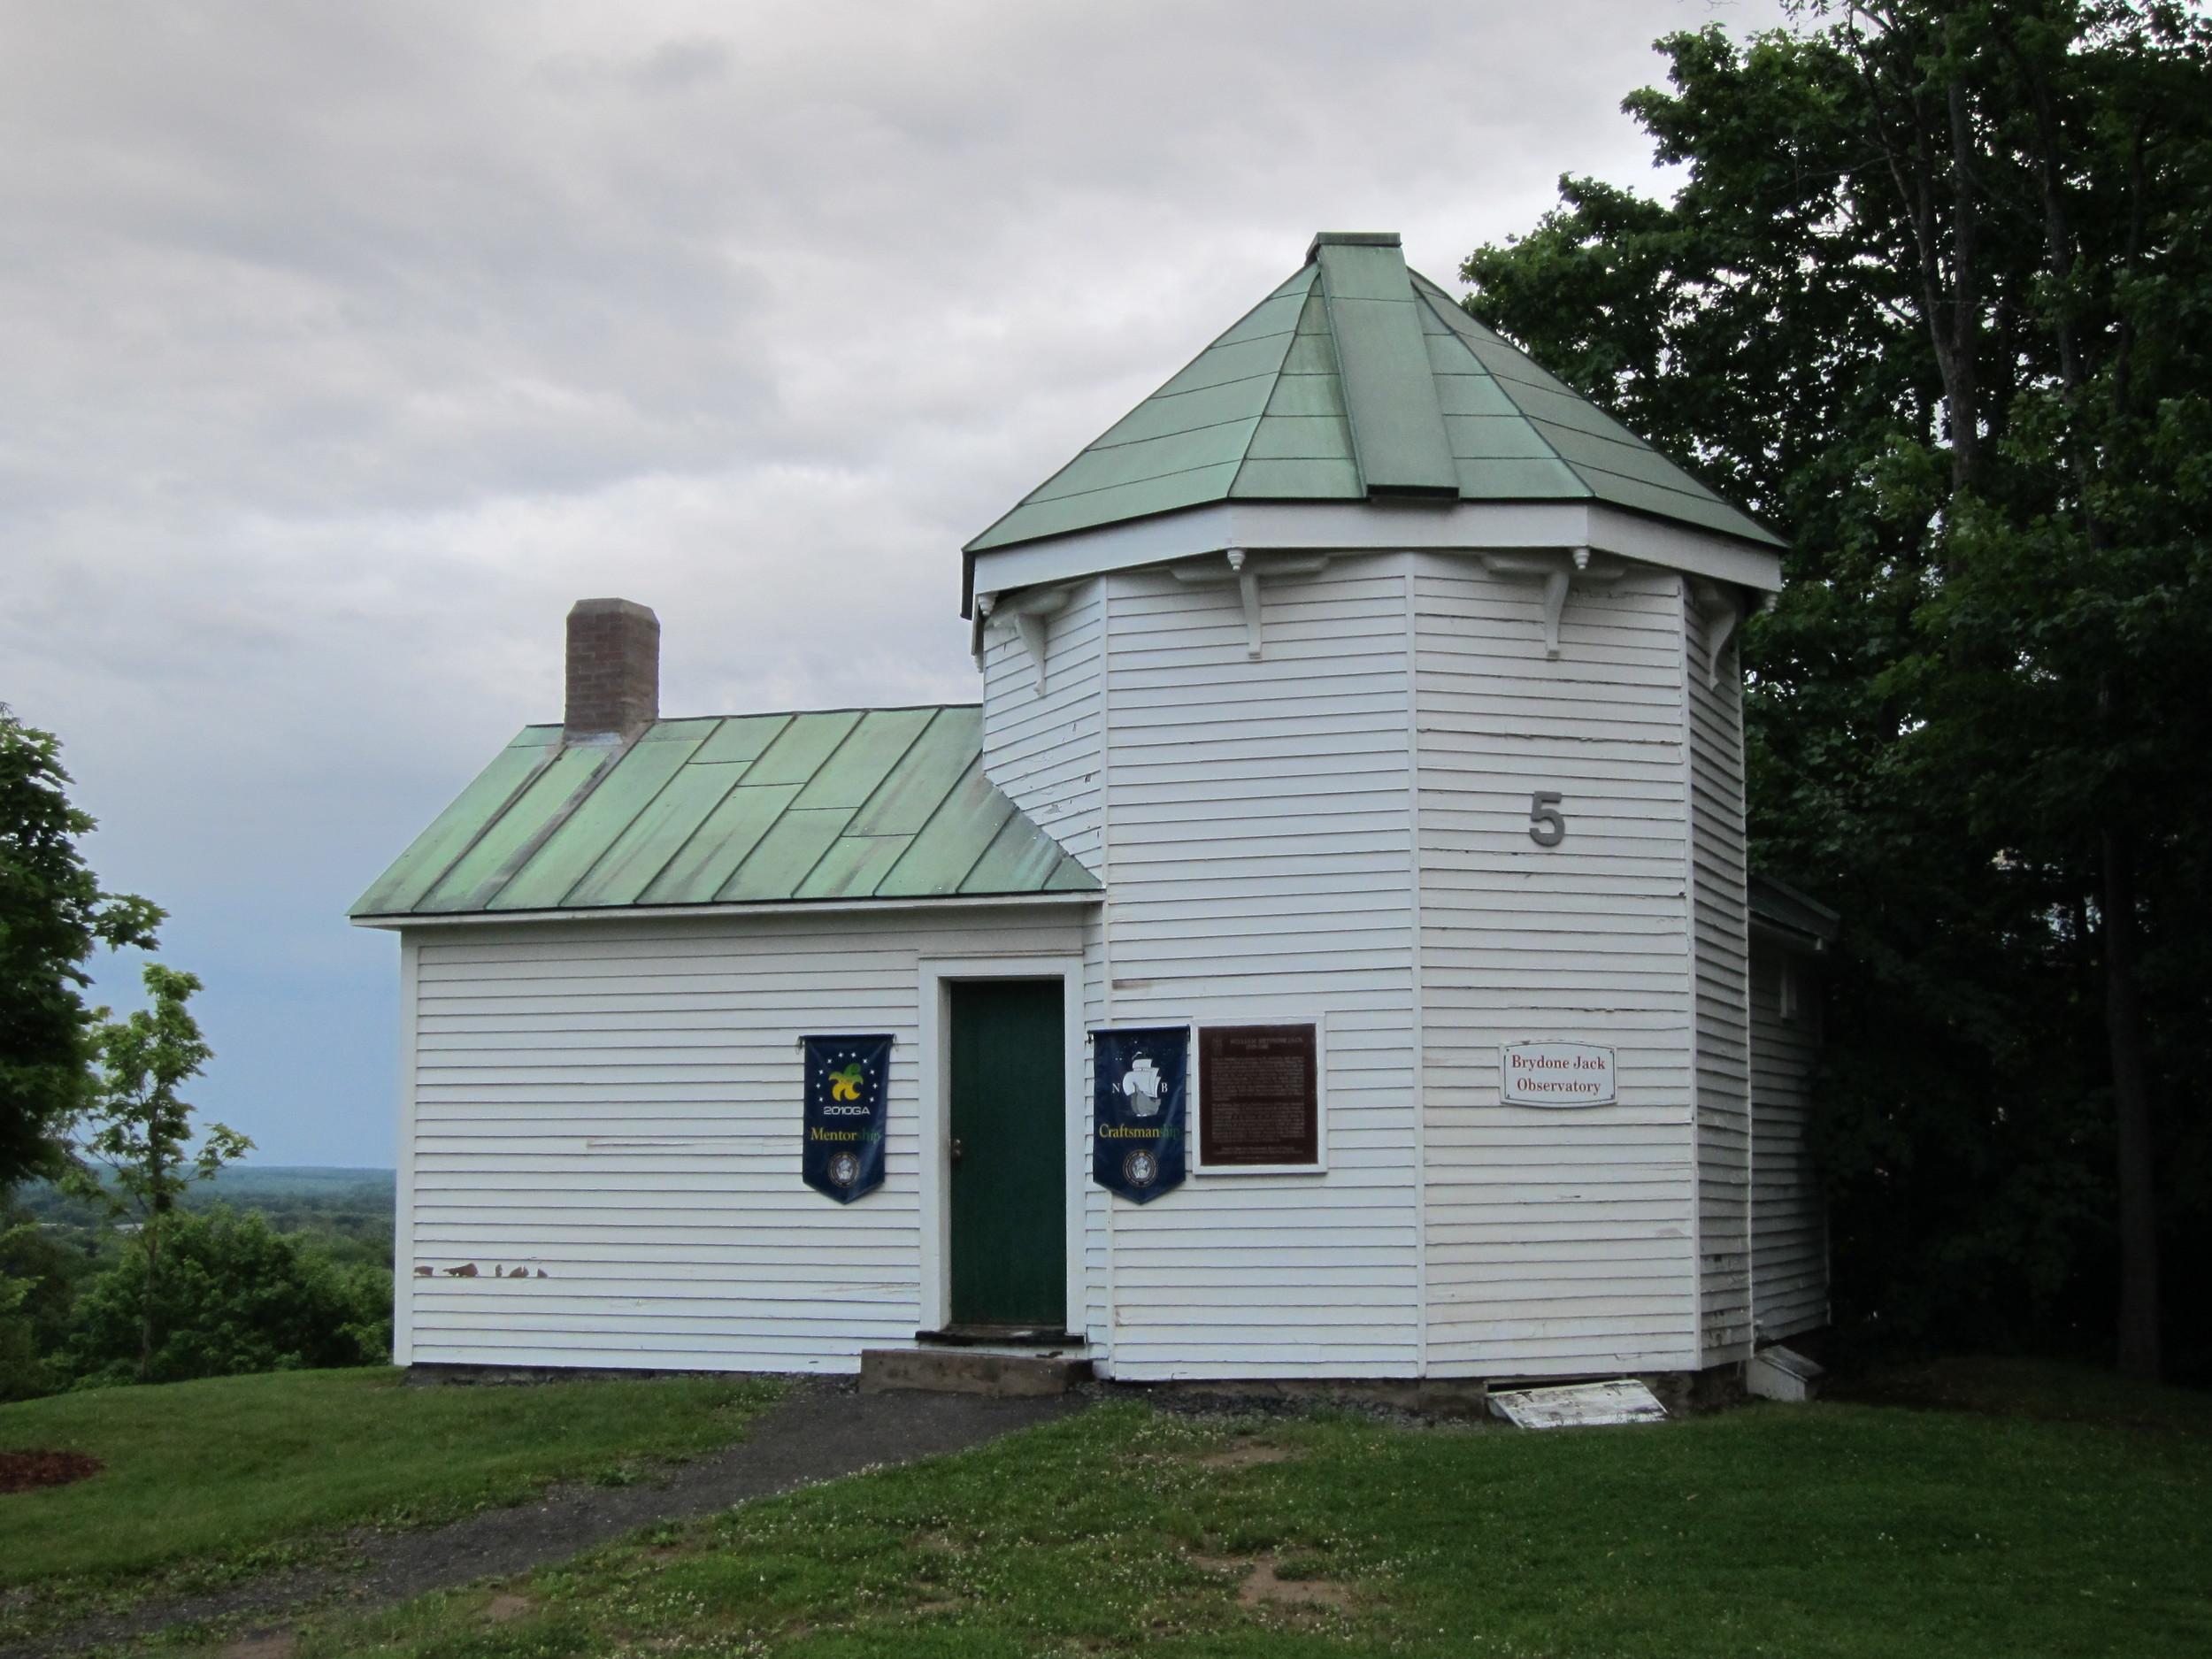 William Brydon Jack Observatory